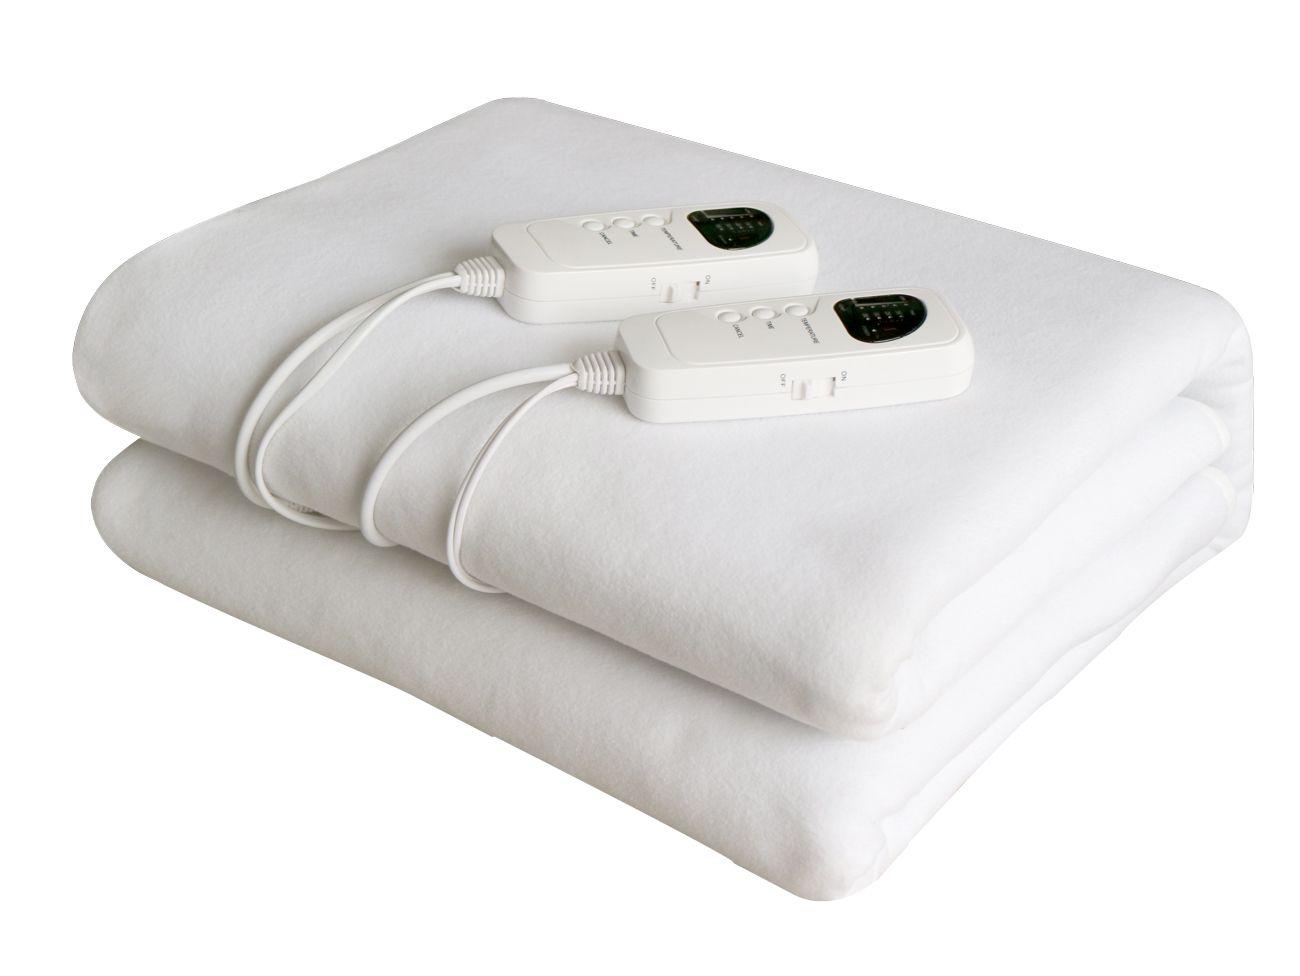 Lençol Térmico Cobertor Elétrico Kenko King Size 193x203cm Luxo Multi Temperaturas   - Kenko Premium Colchões